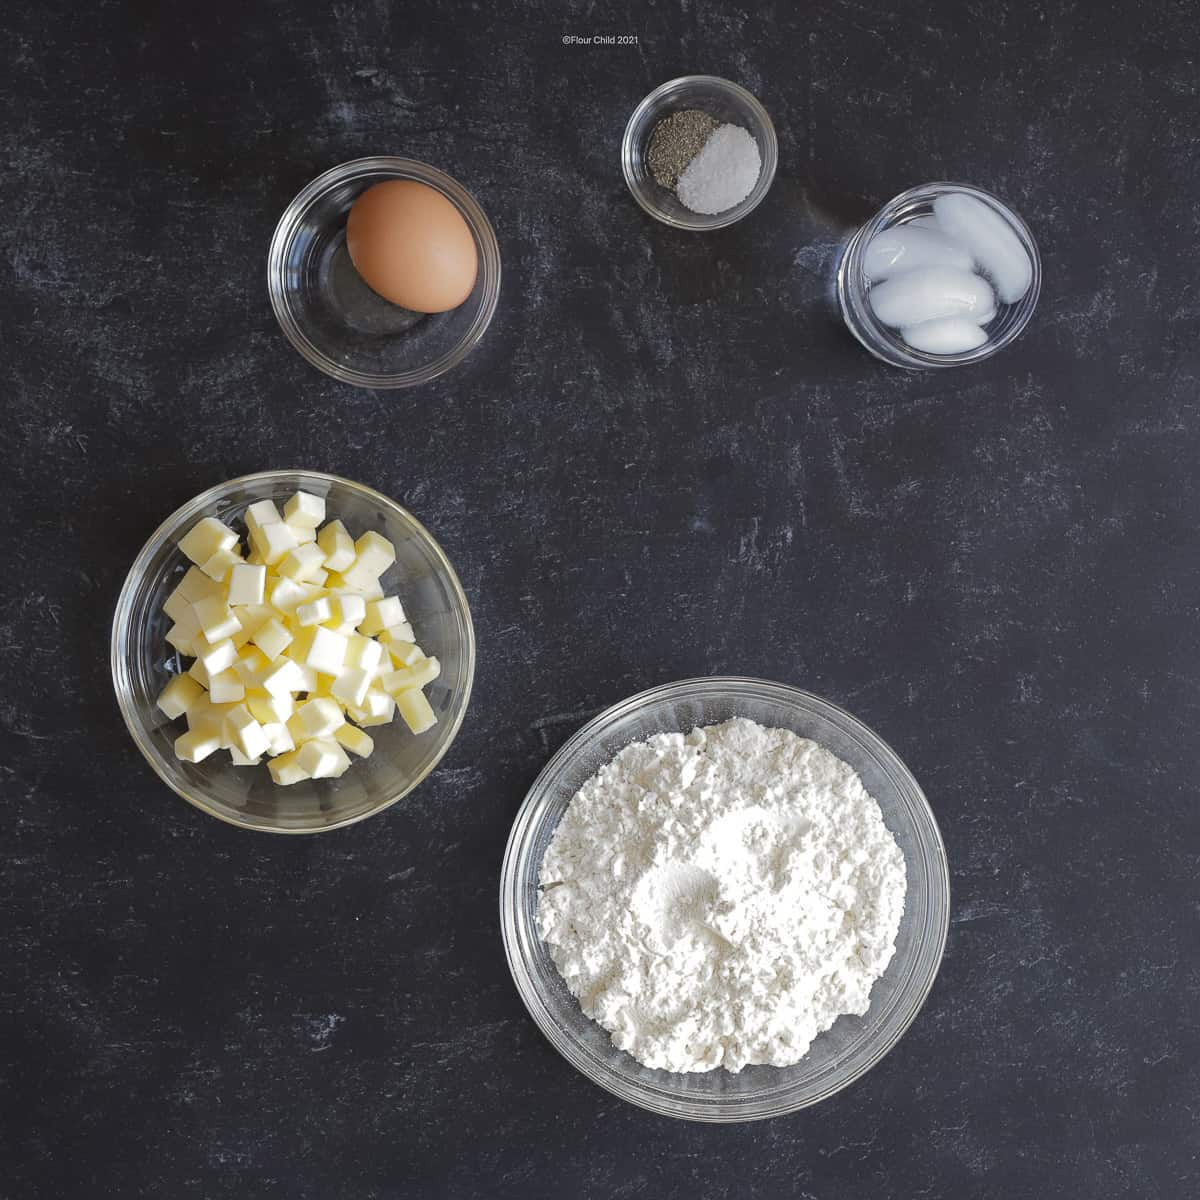 Homemade quiche crust ingredients